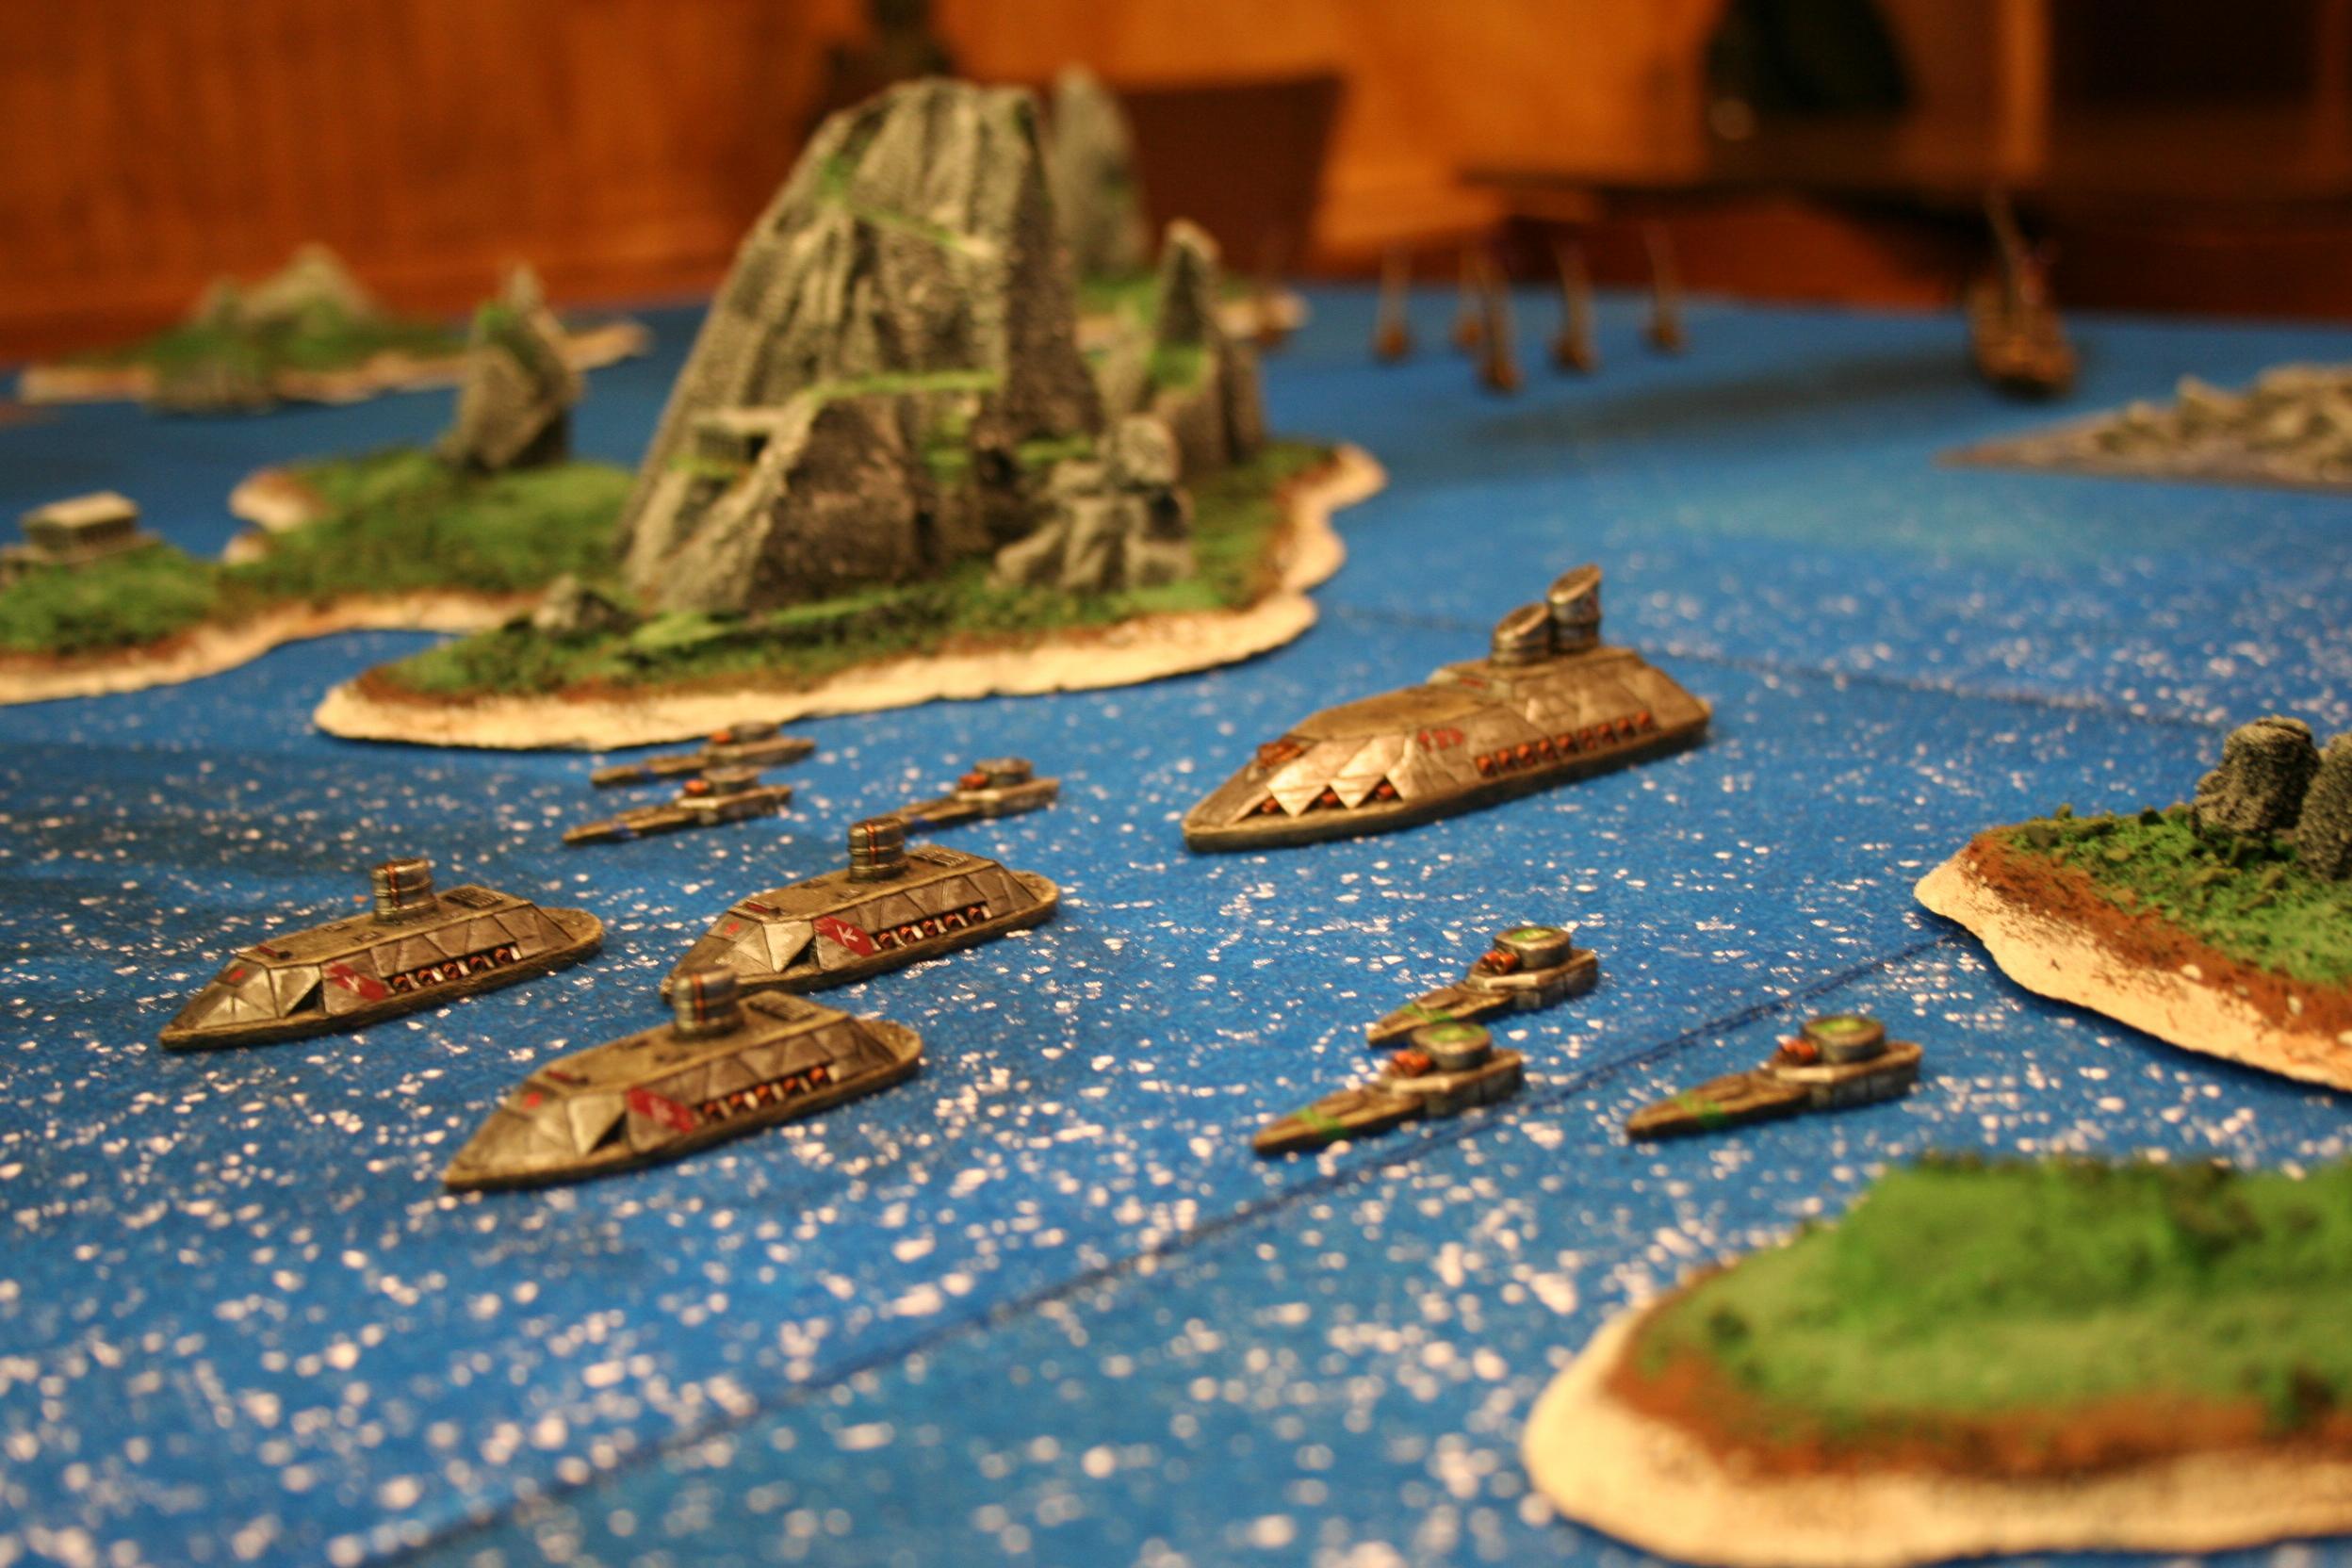 Craig, D6 Generation, Dwarves, Fleet, Iron Dwarves, Island, Starter, Uncharted Seas